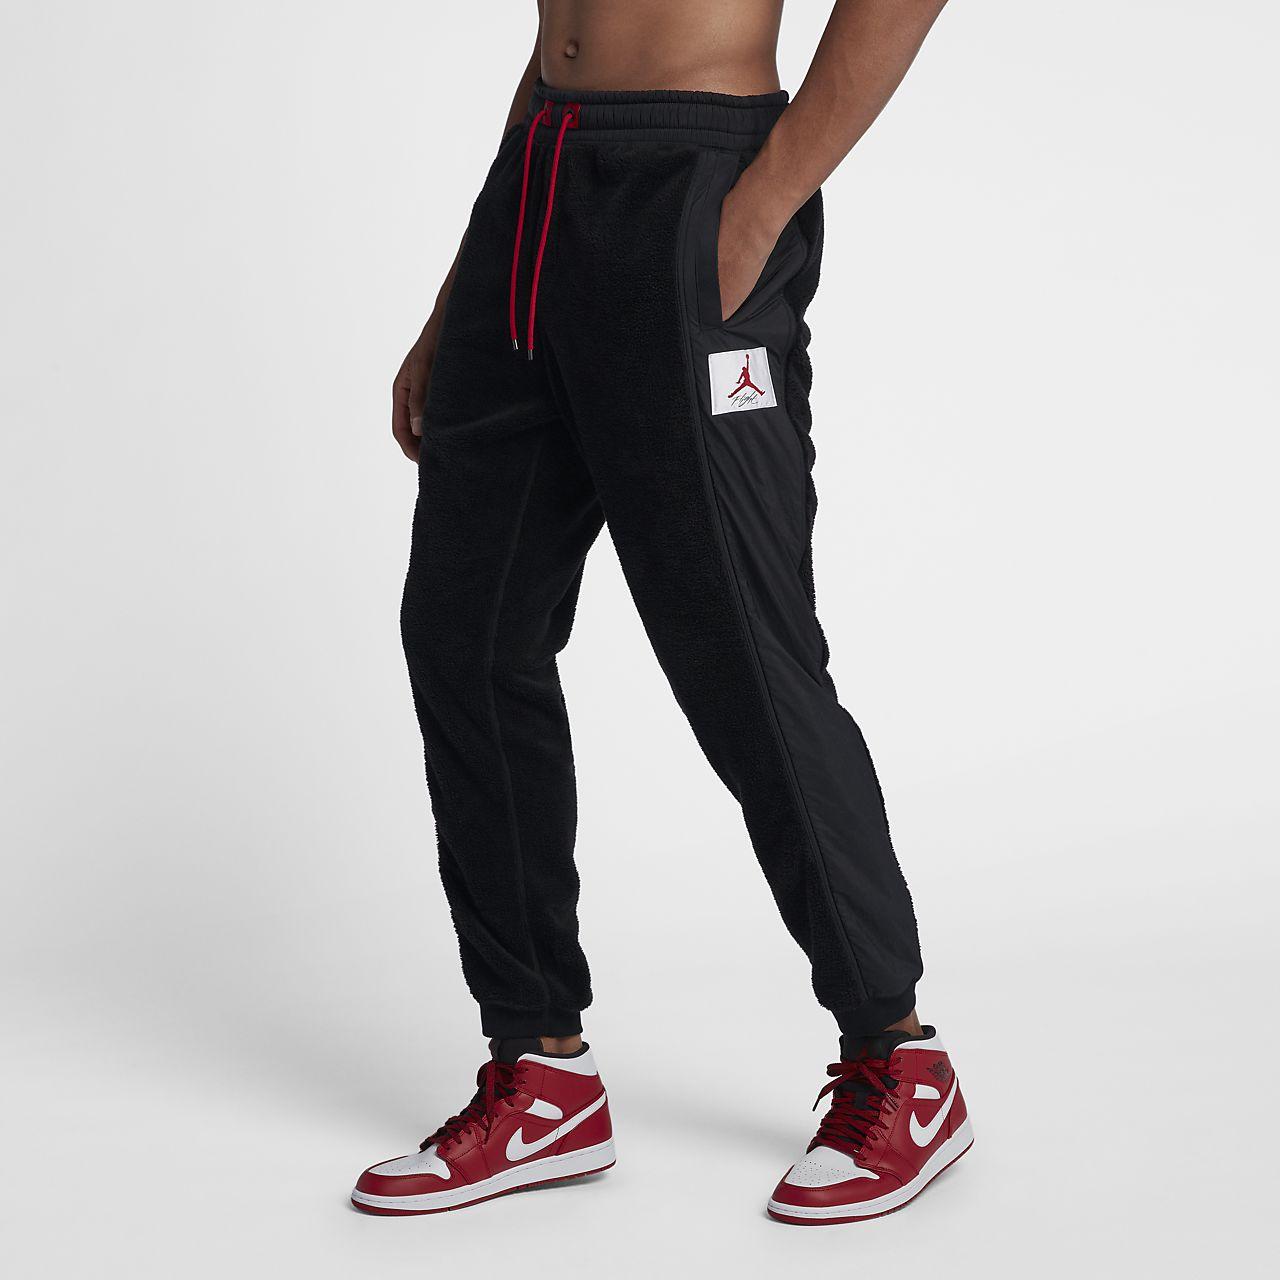 brand new f878d bc6fc Men s Fleece Trousers. Jordan Wings